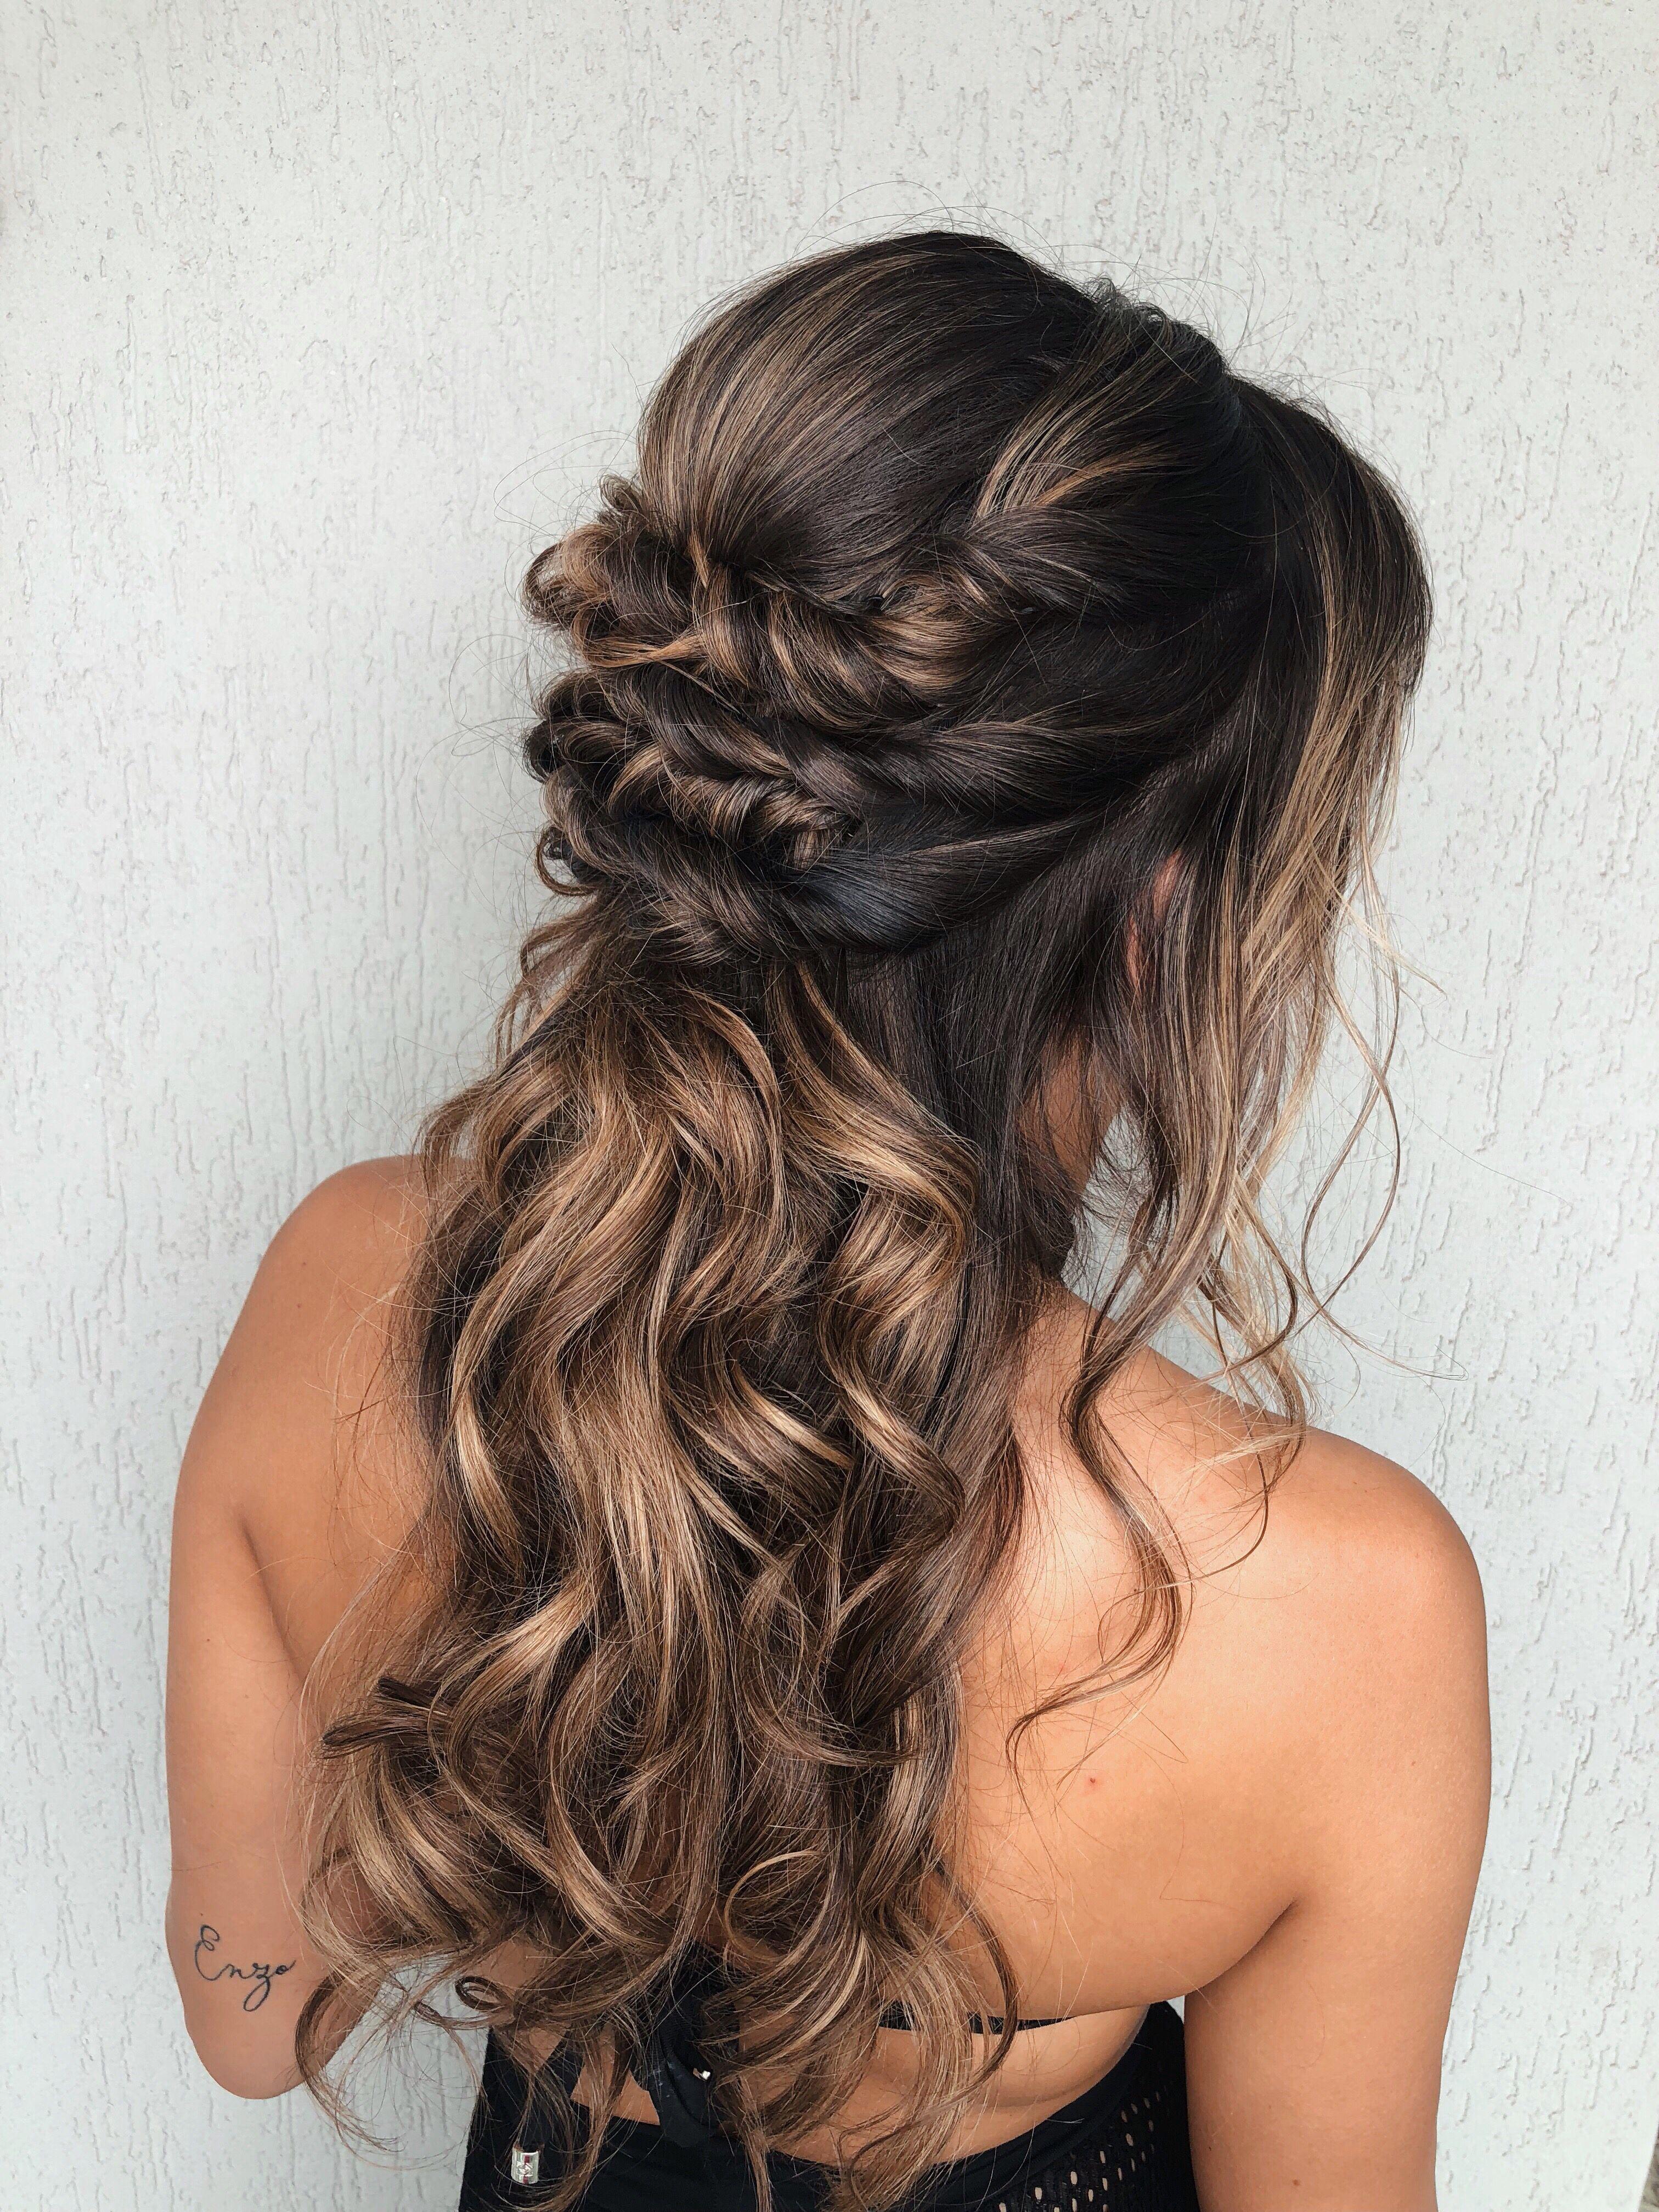 2019 year looks- Cut hair prom inspiration